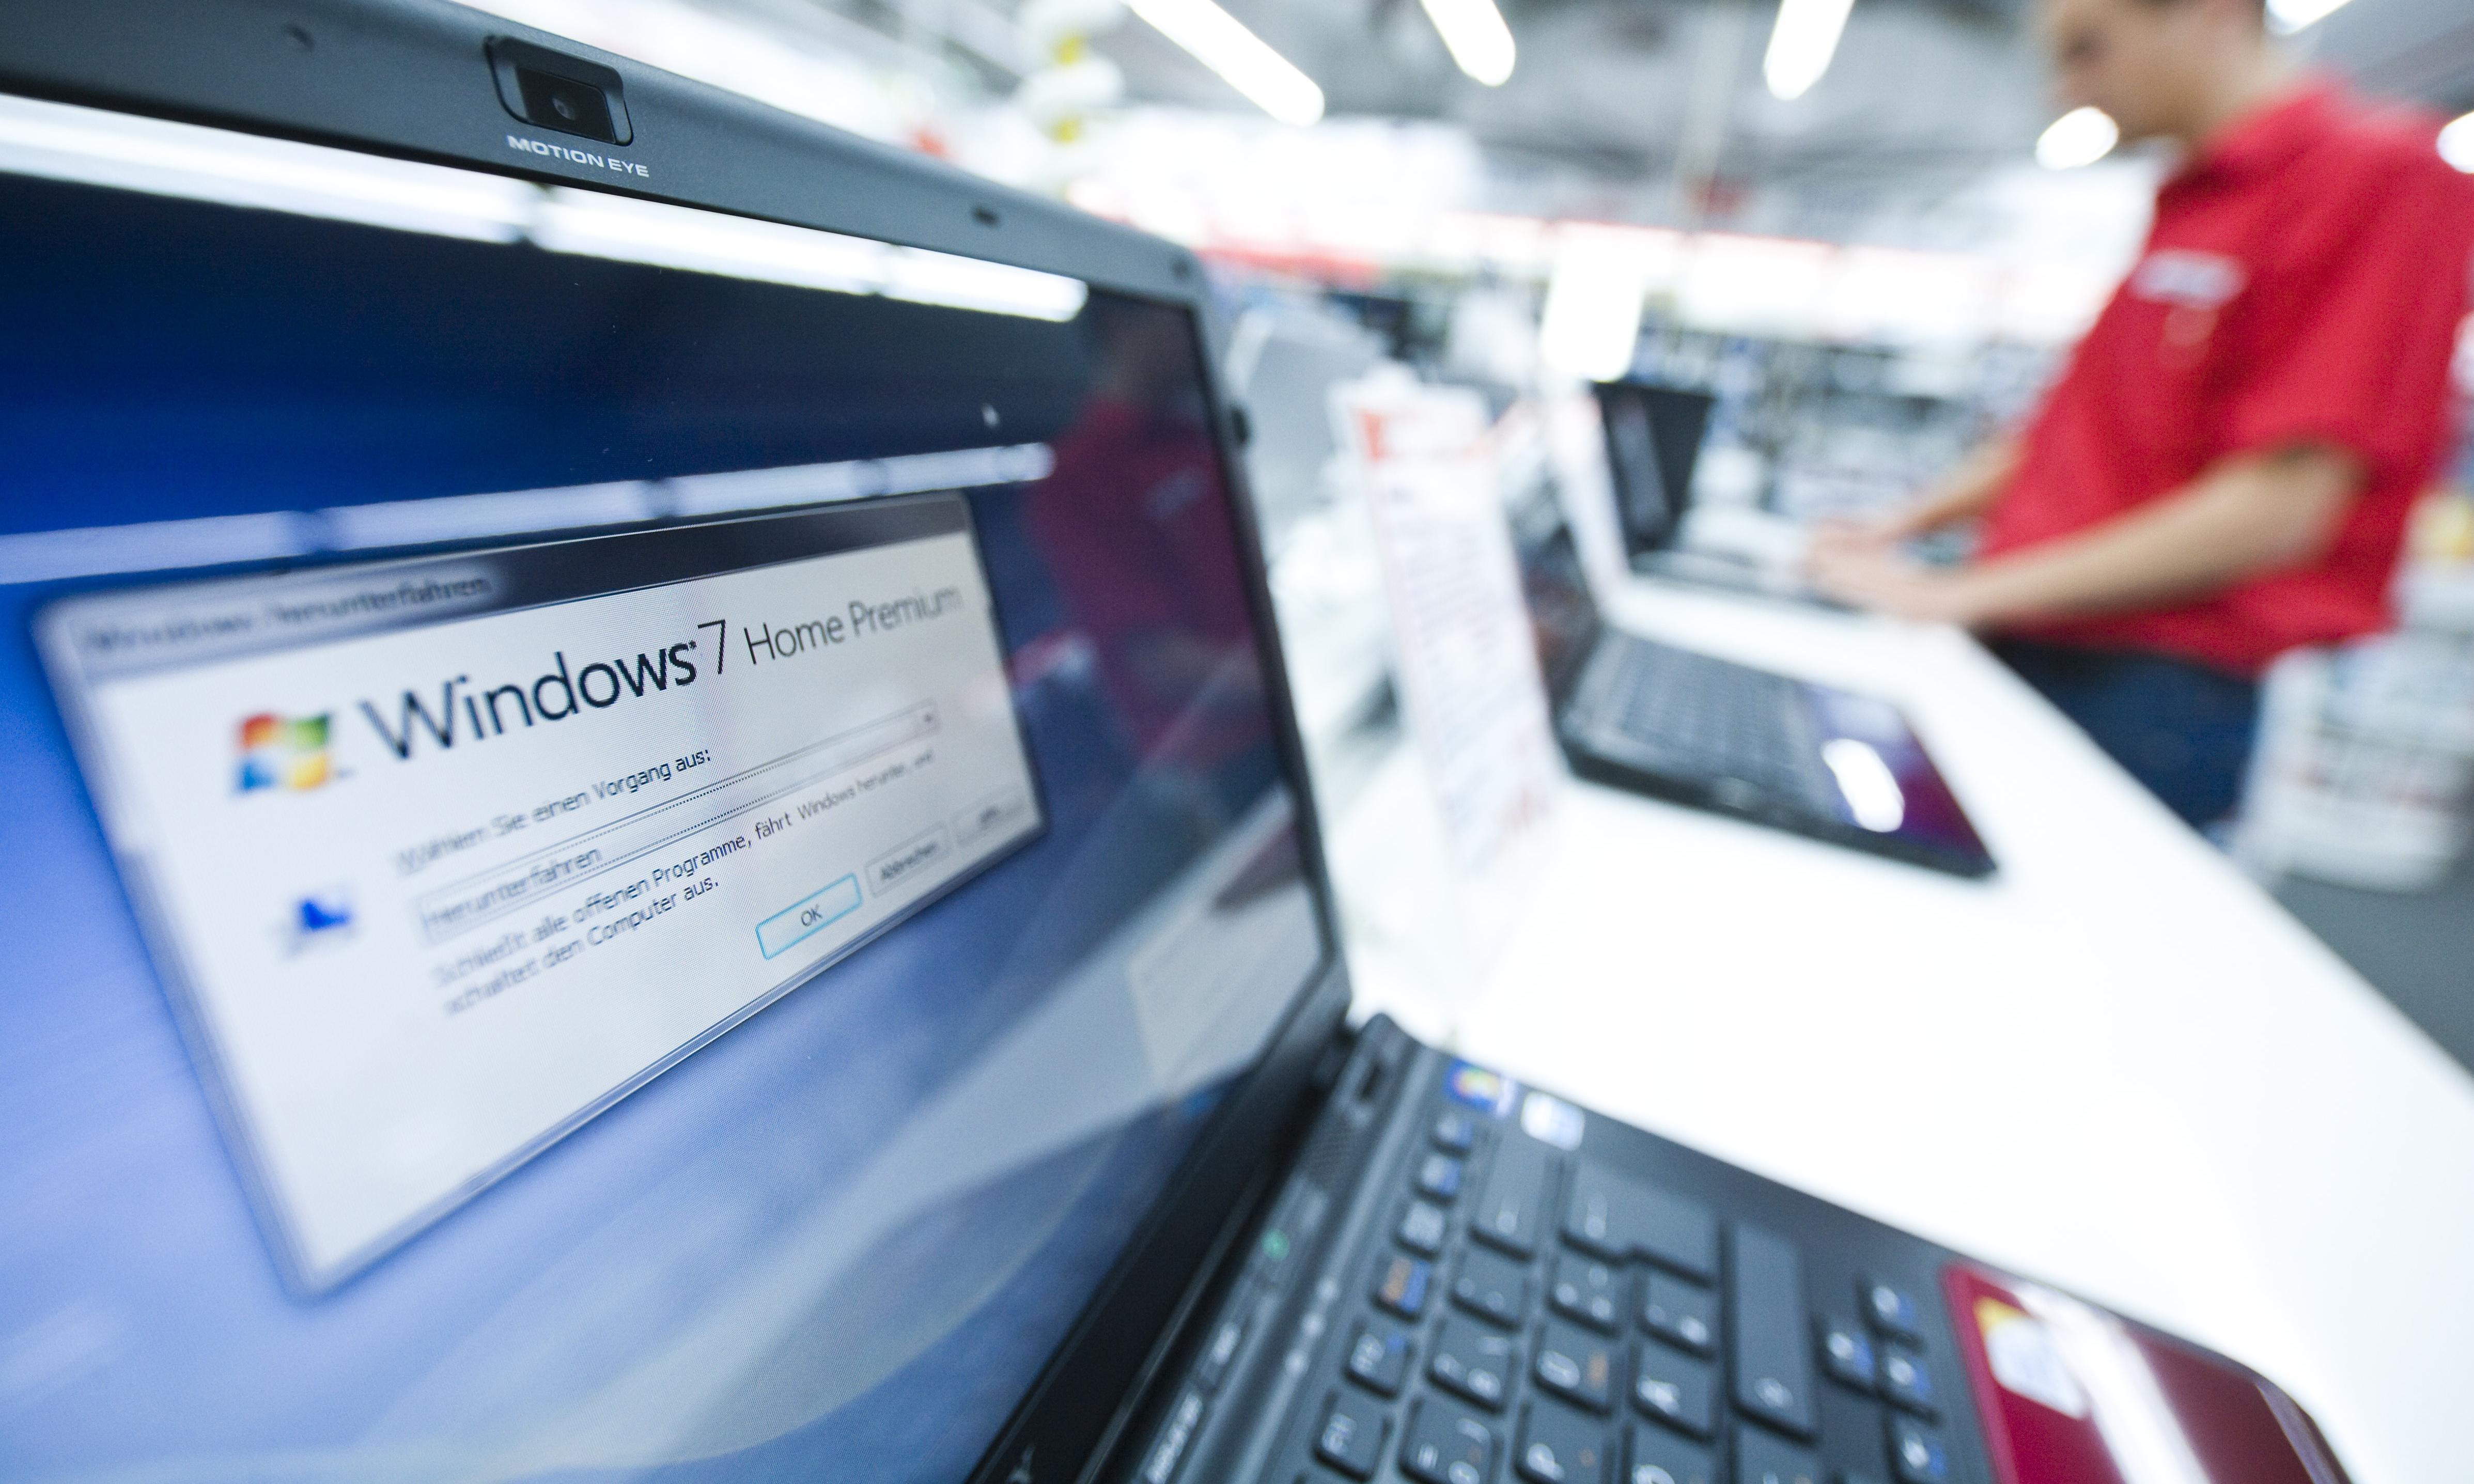 I'm still on Windows 7 – what should I do?